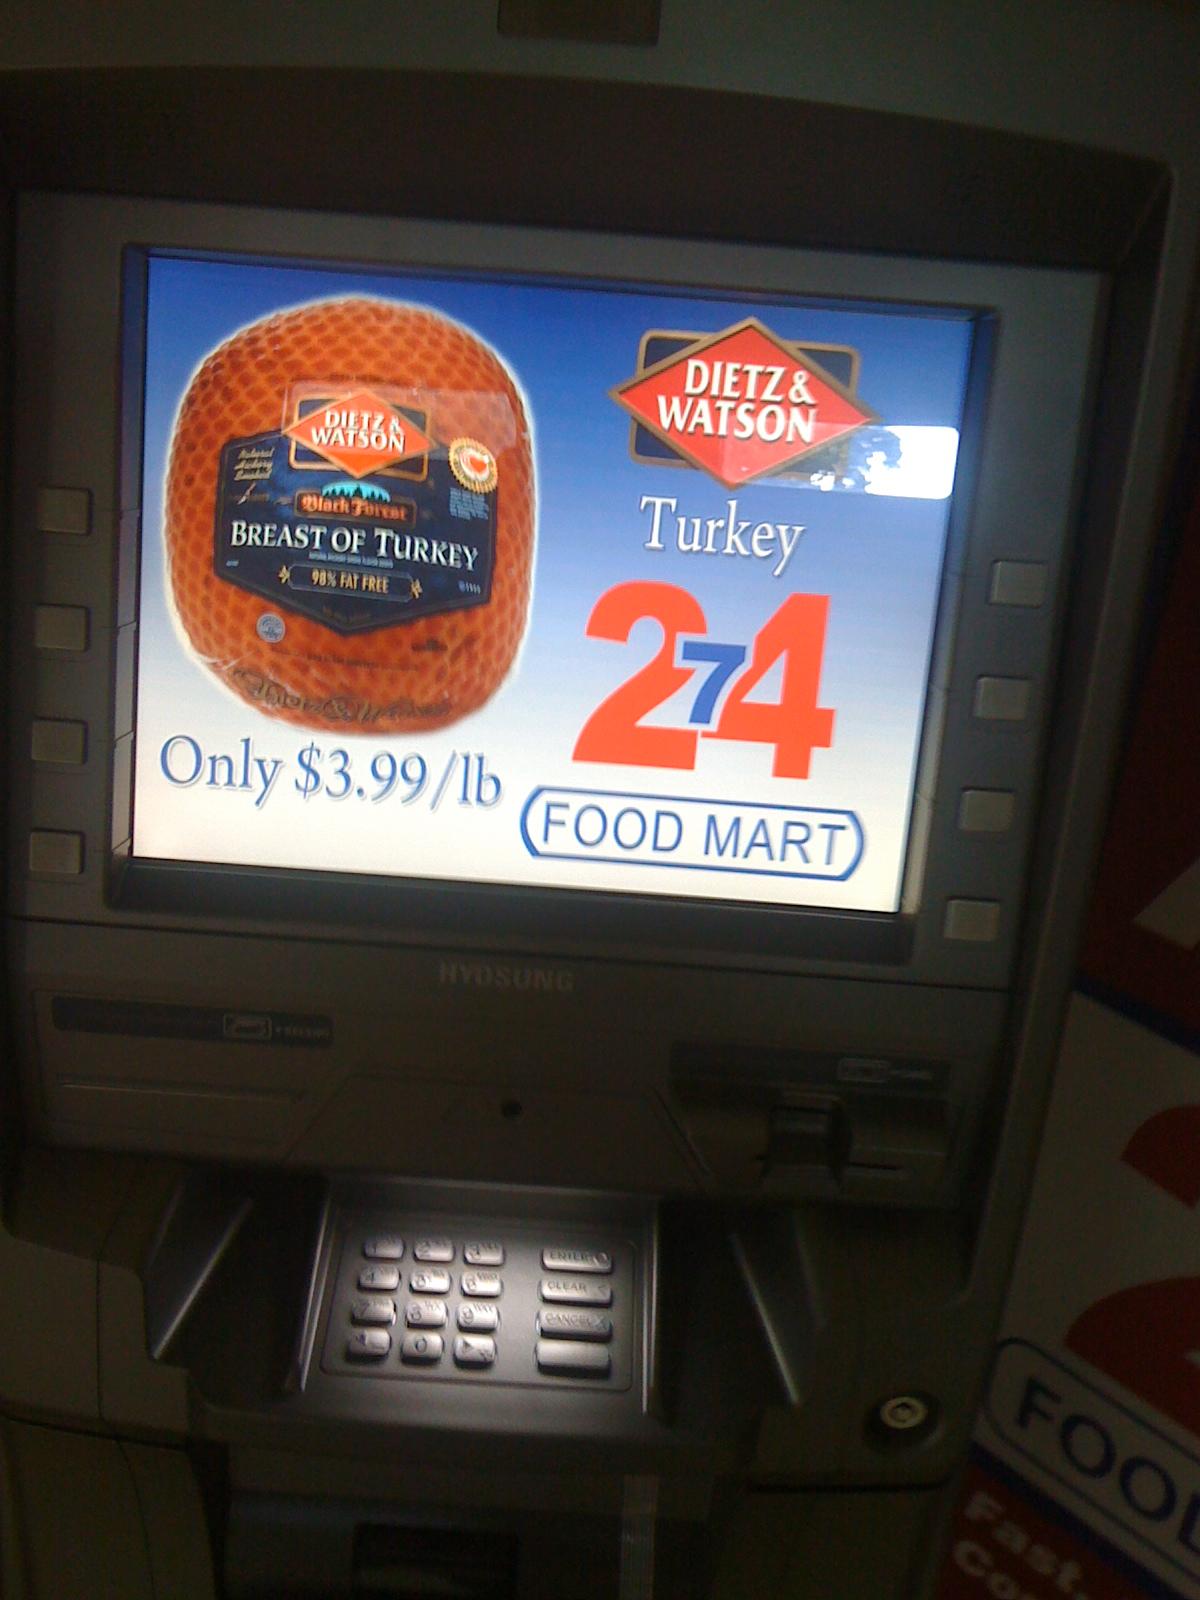 ATM - Only $3.99/lb